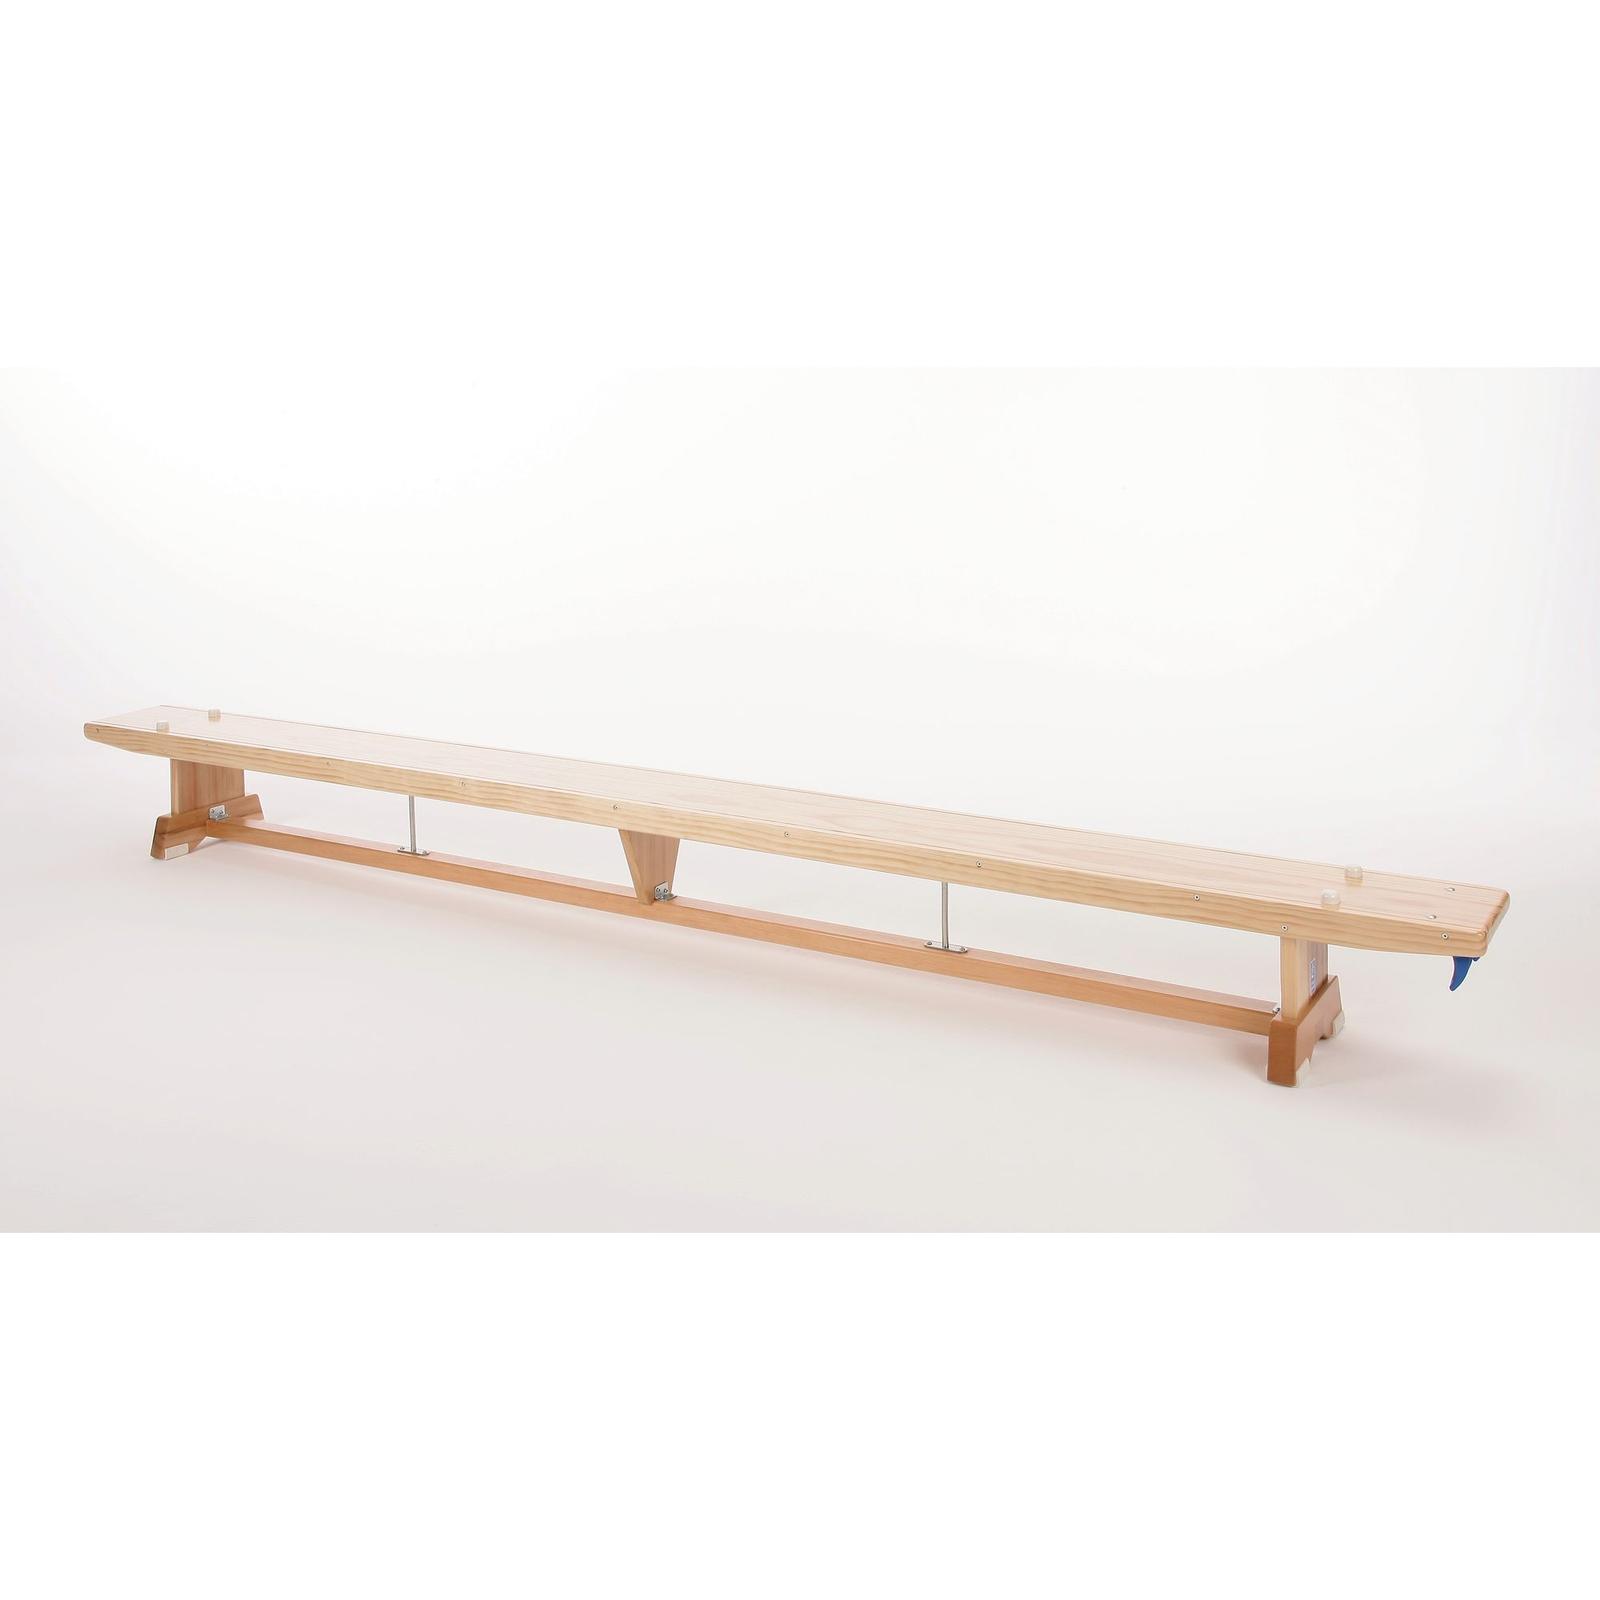 Balance Bench - 2.7m - Hooks Both Ends